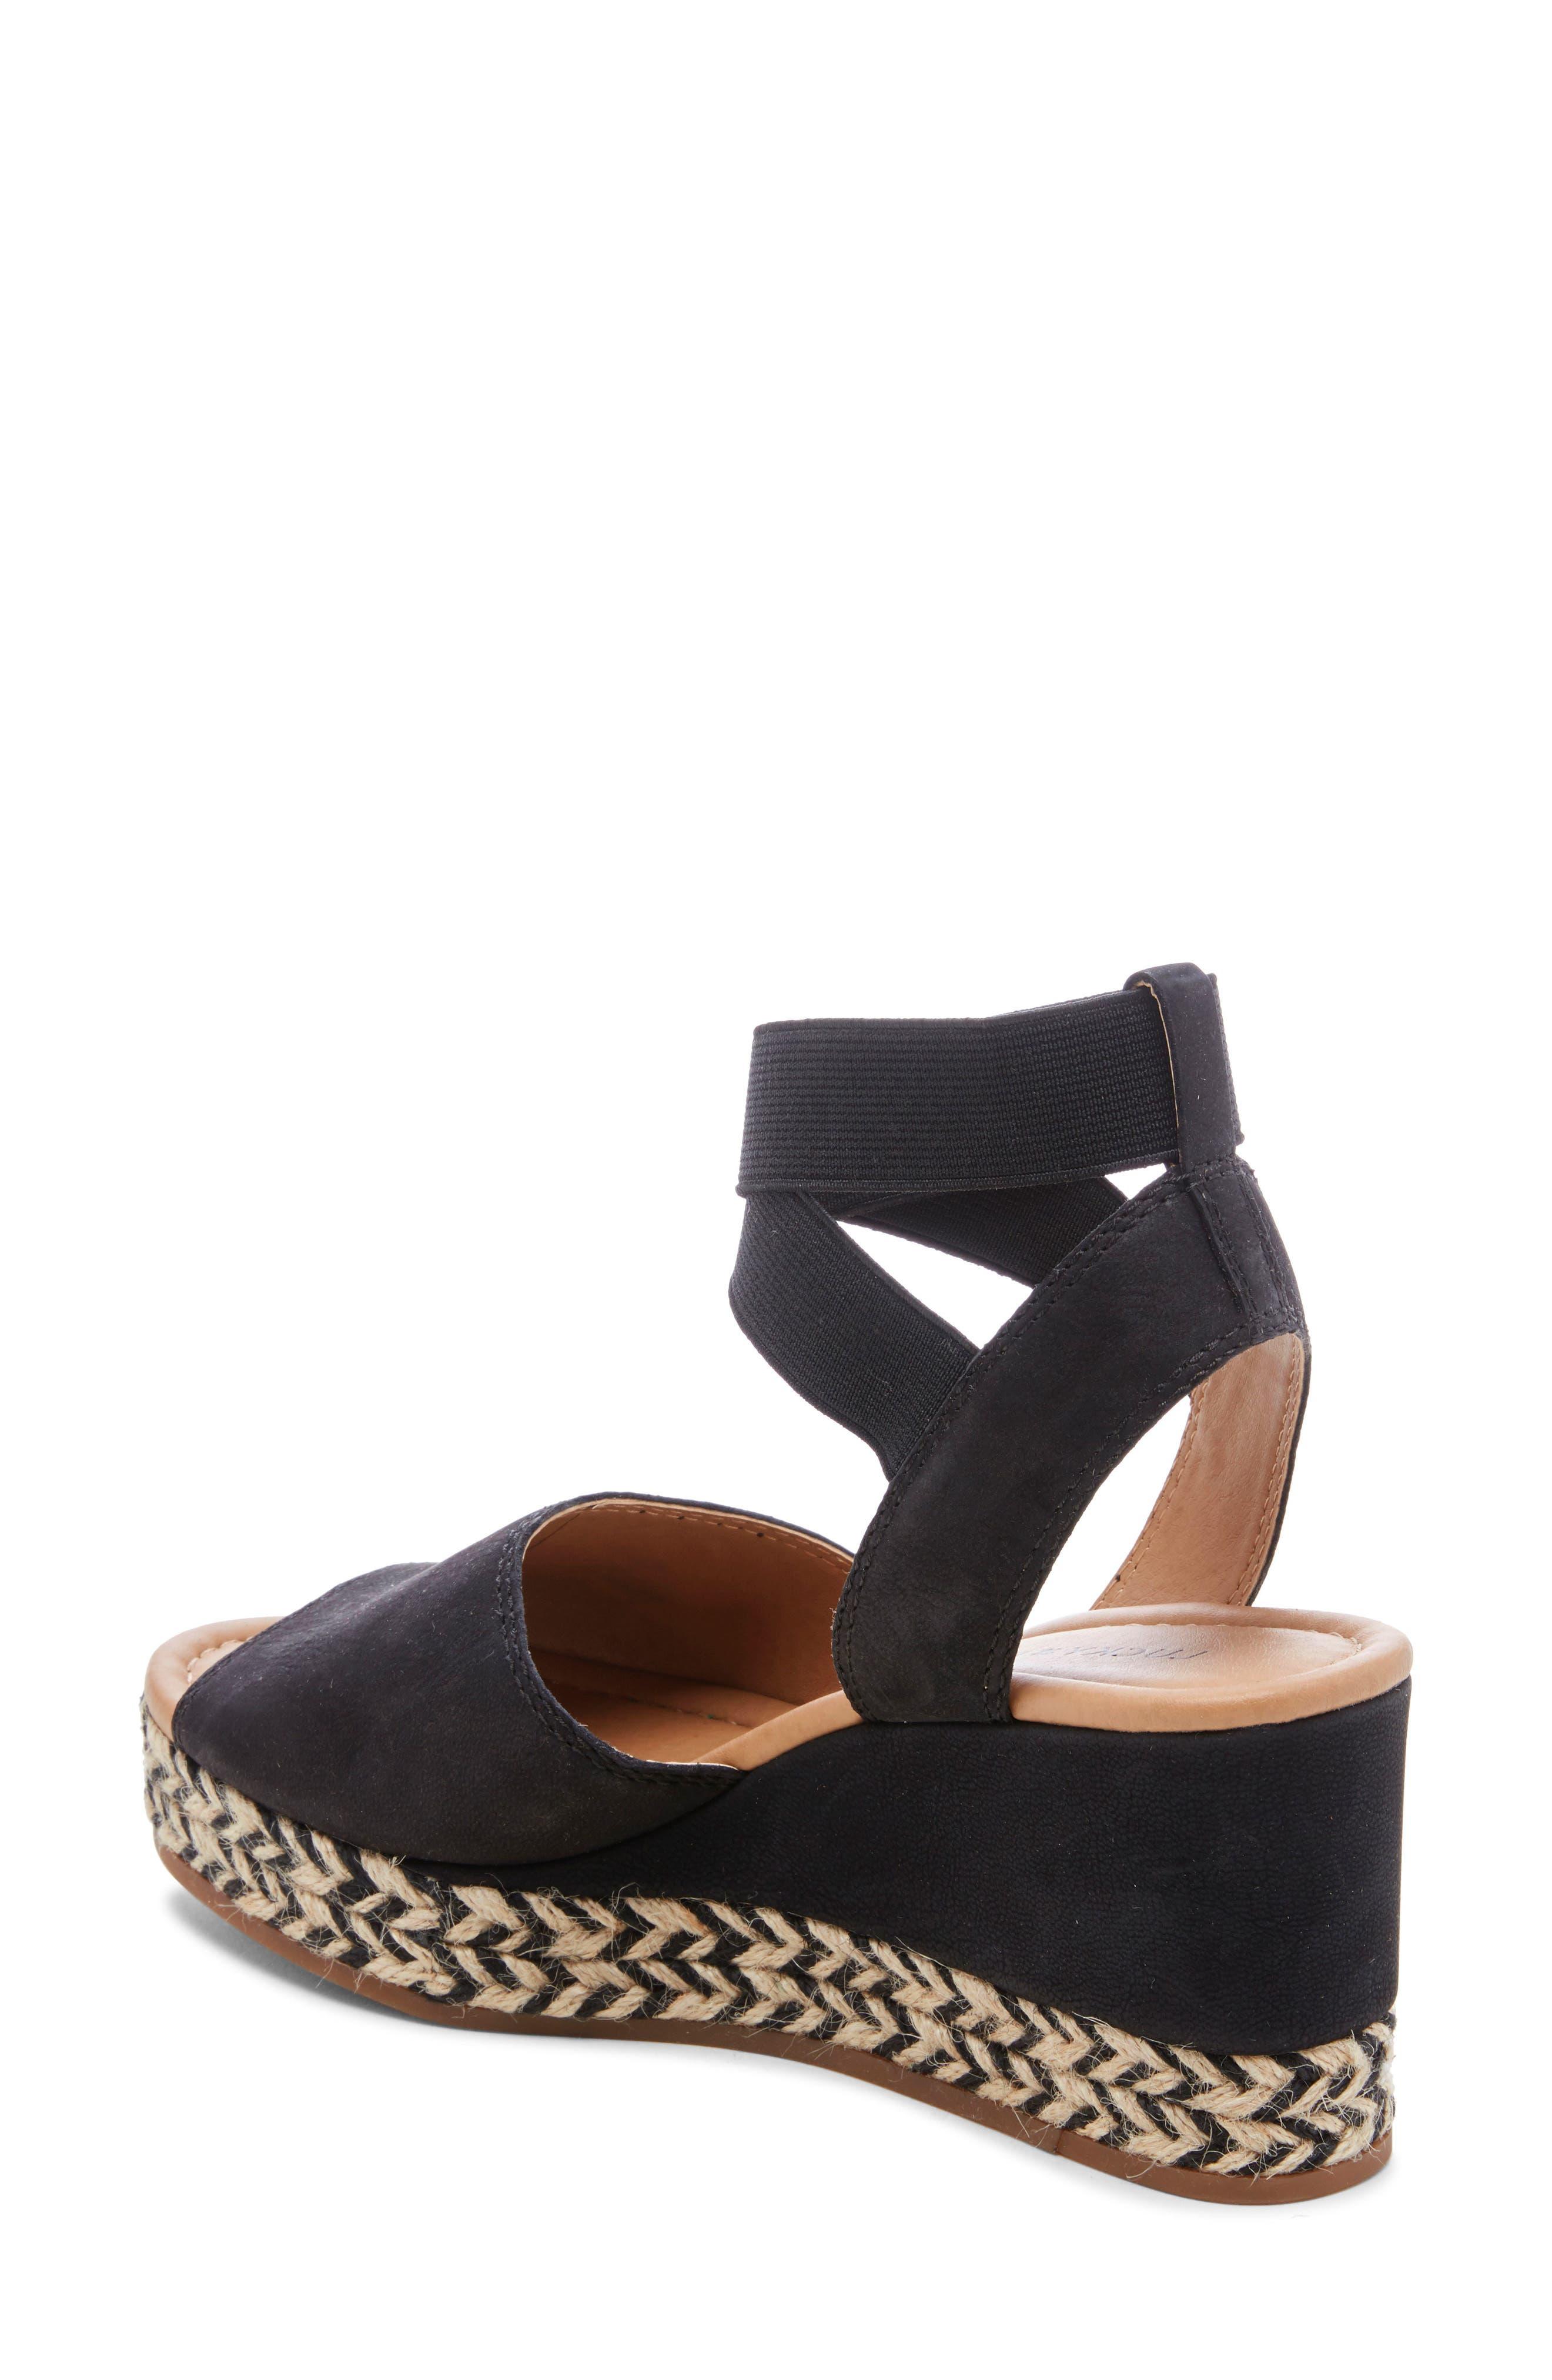 ,                             Bettanie Espadrille Wedge Sandal,                             Alternate thumbnail 2, color,                             BLACK LEATHER